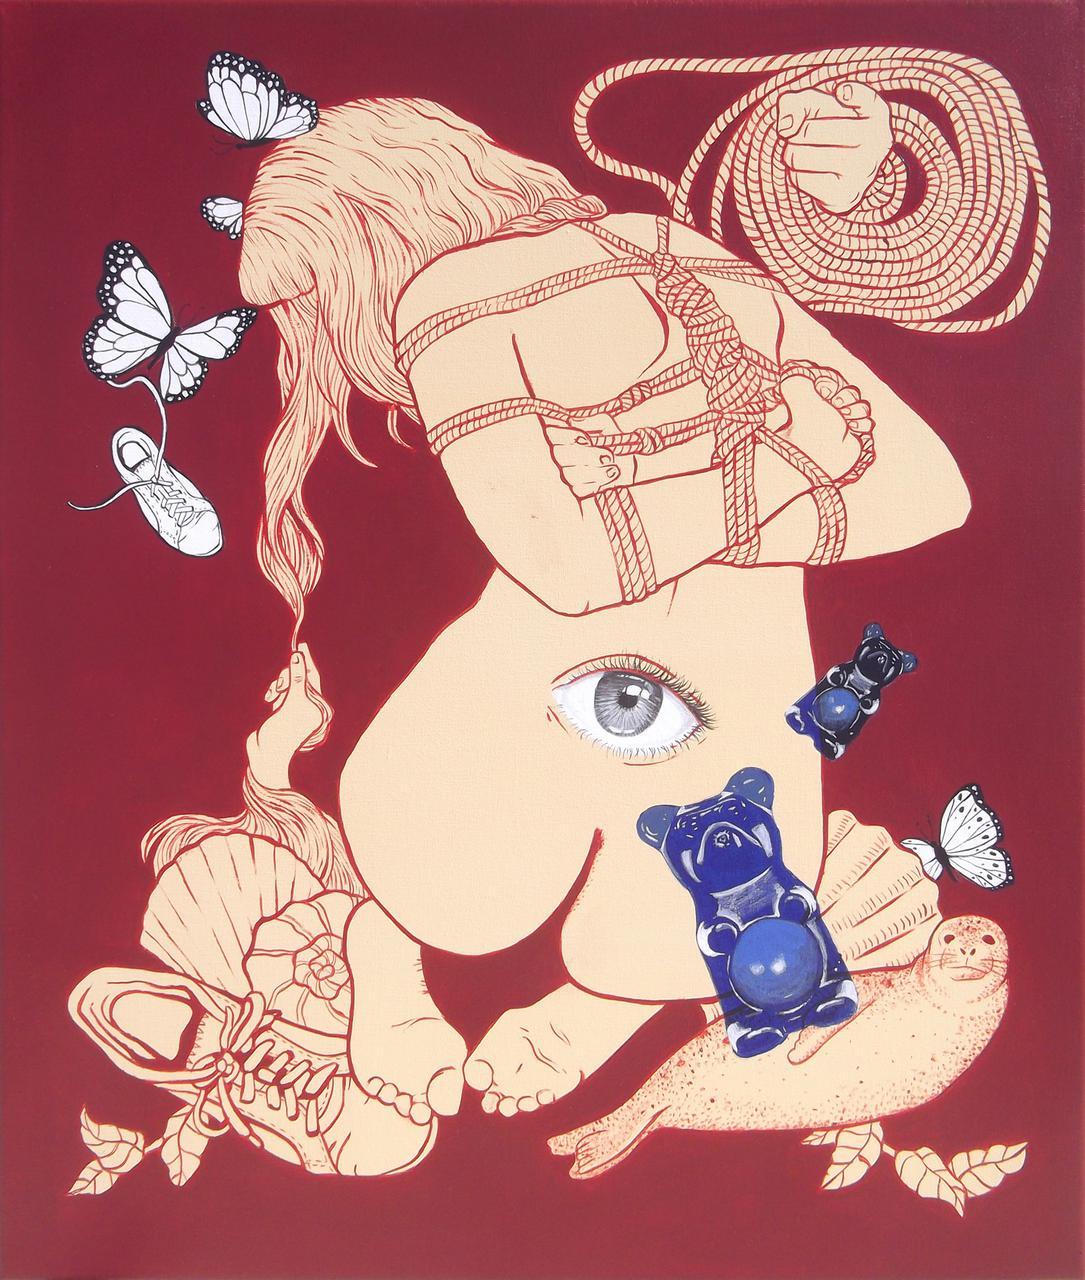 Untitled, acrylic on canvas, 52 x 62 cm